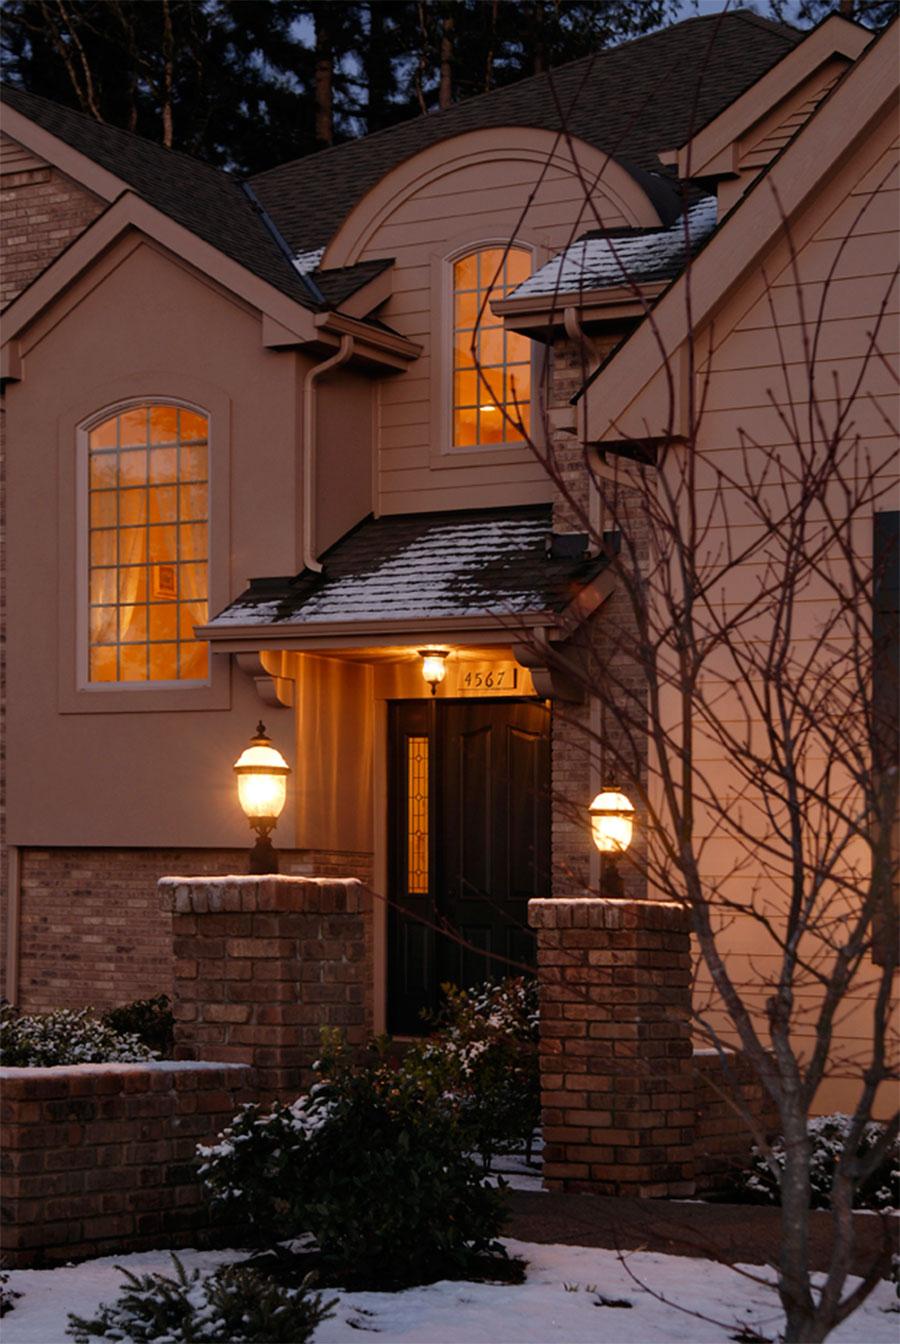 kaufman-homes-custom-home-sunset-ridge-2